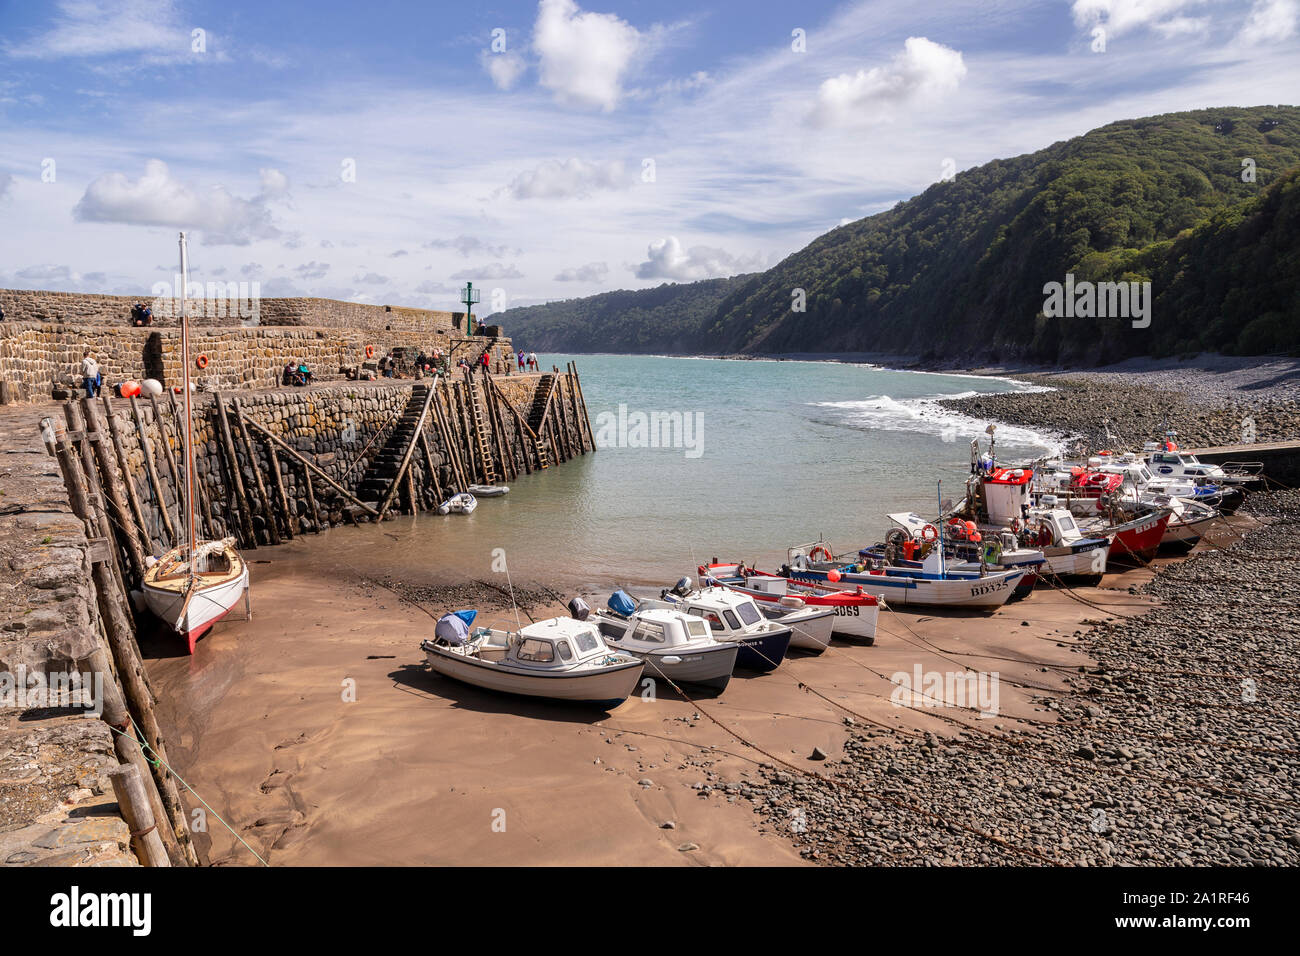 Clovelly harbour on the North Devon coast, England Stock Photo